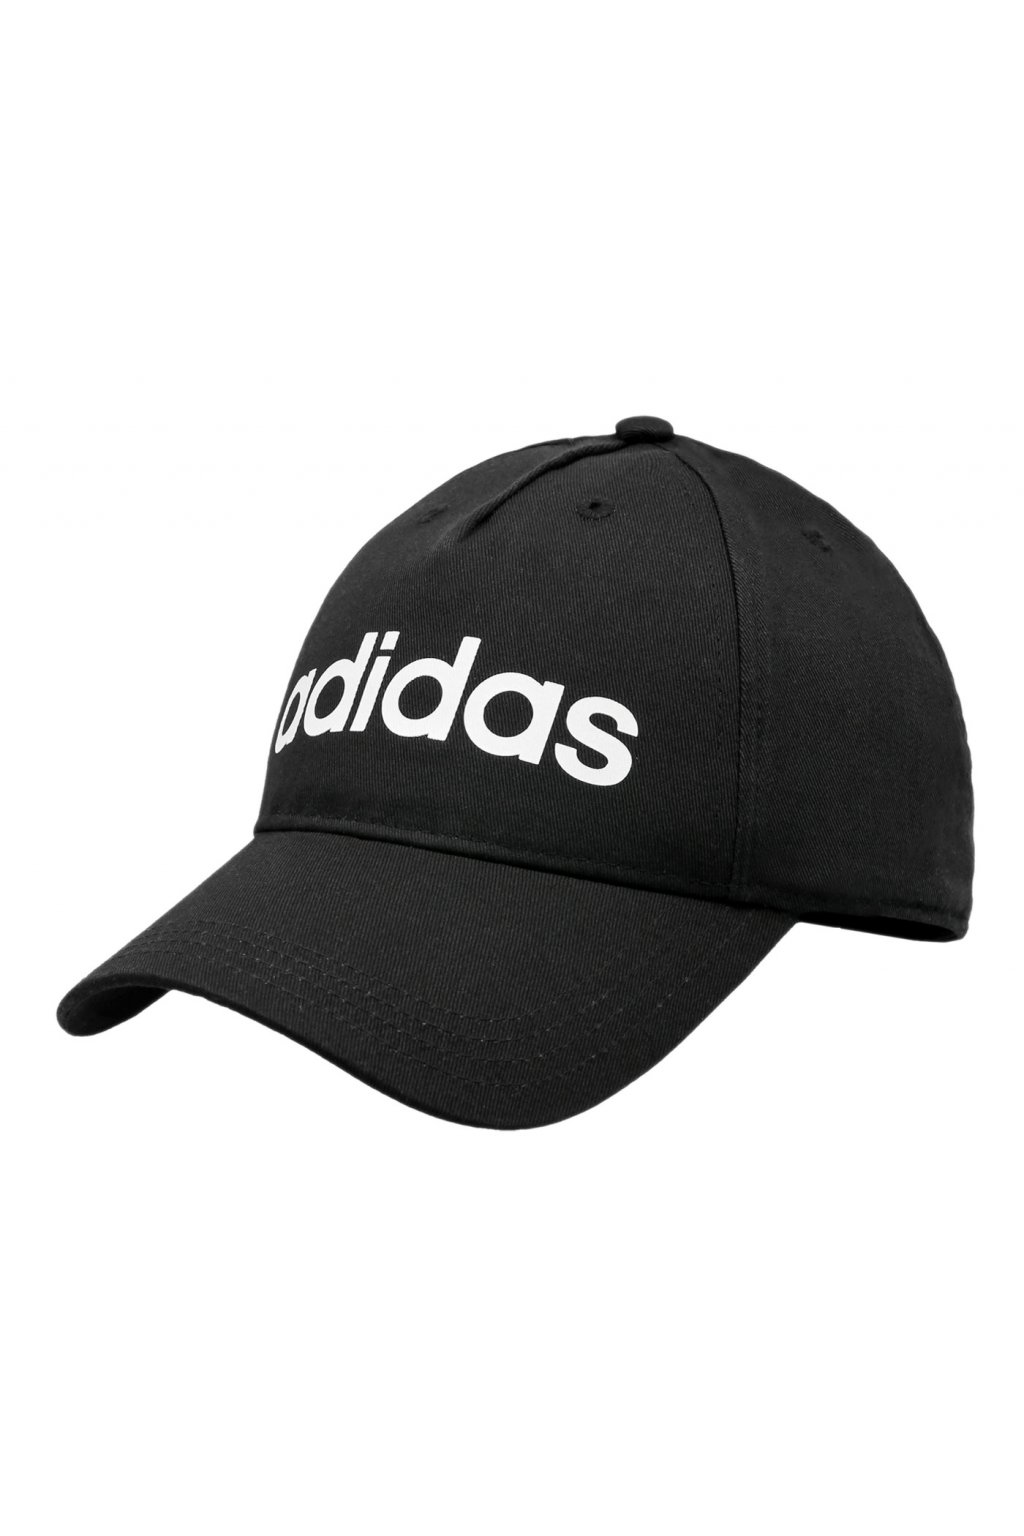 Šiltovka Adidas DAILY CAP čierna DM6178